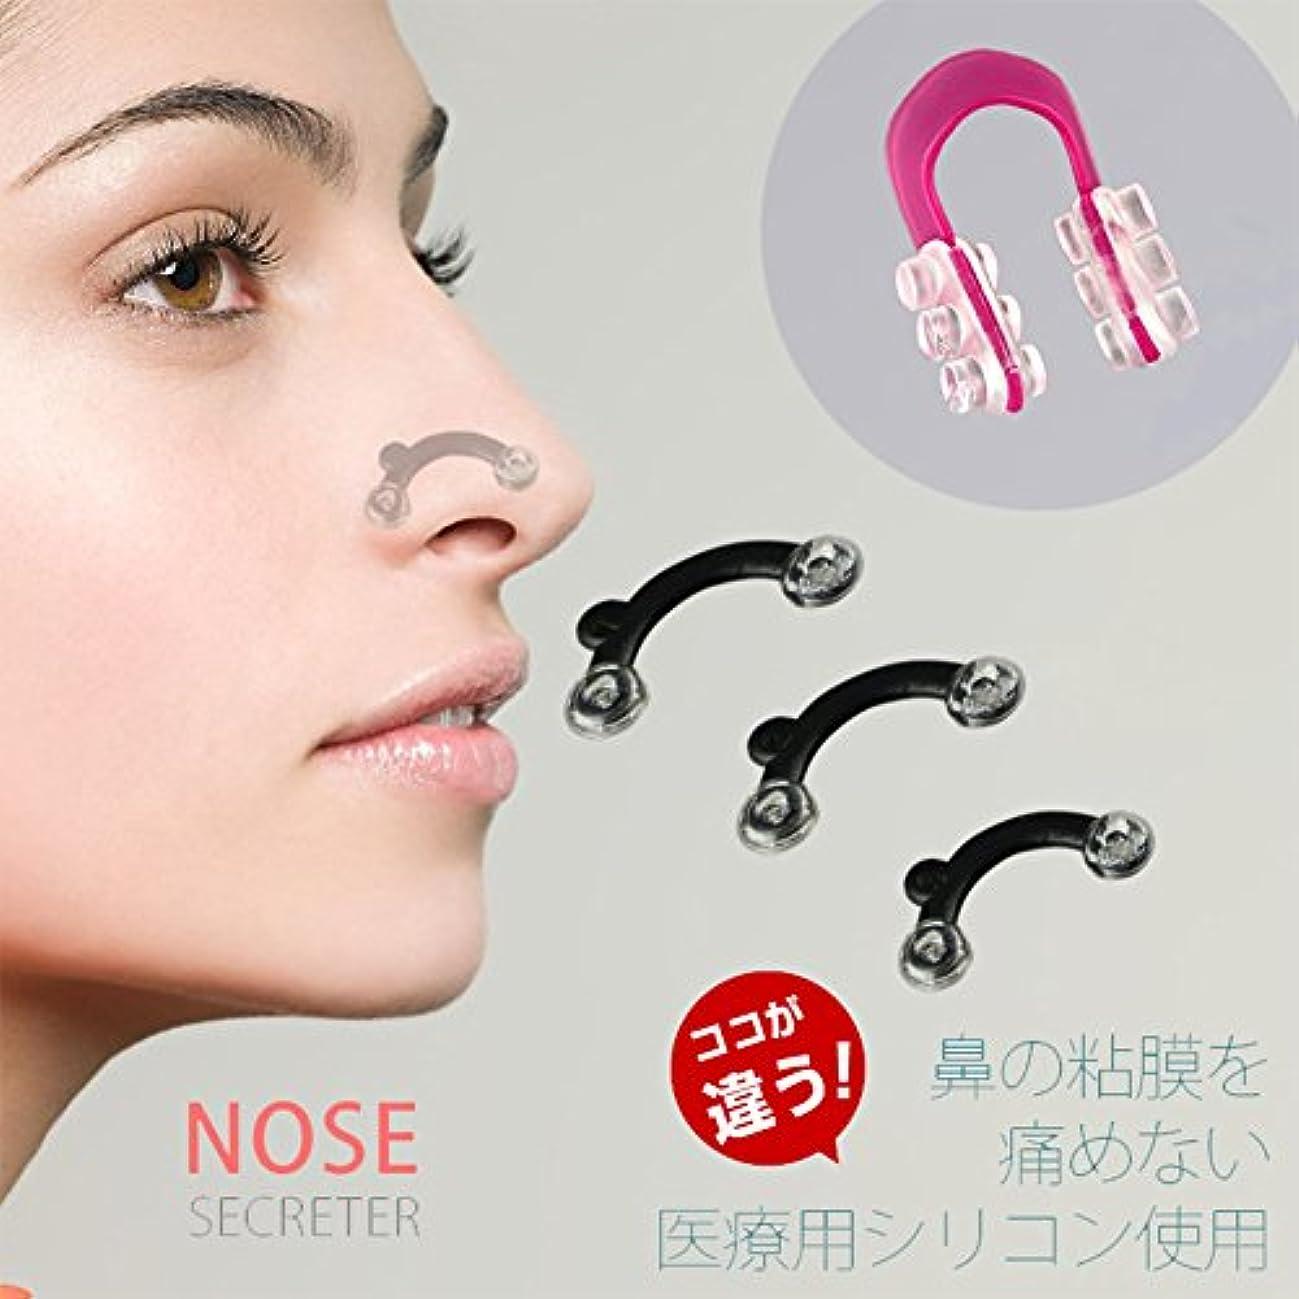 MR 4点セット 小顔効果 ノーズチャーム プチ整形 3サイズ コスメ 韓国 ファッション MR-NOSECHARM